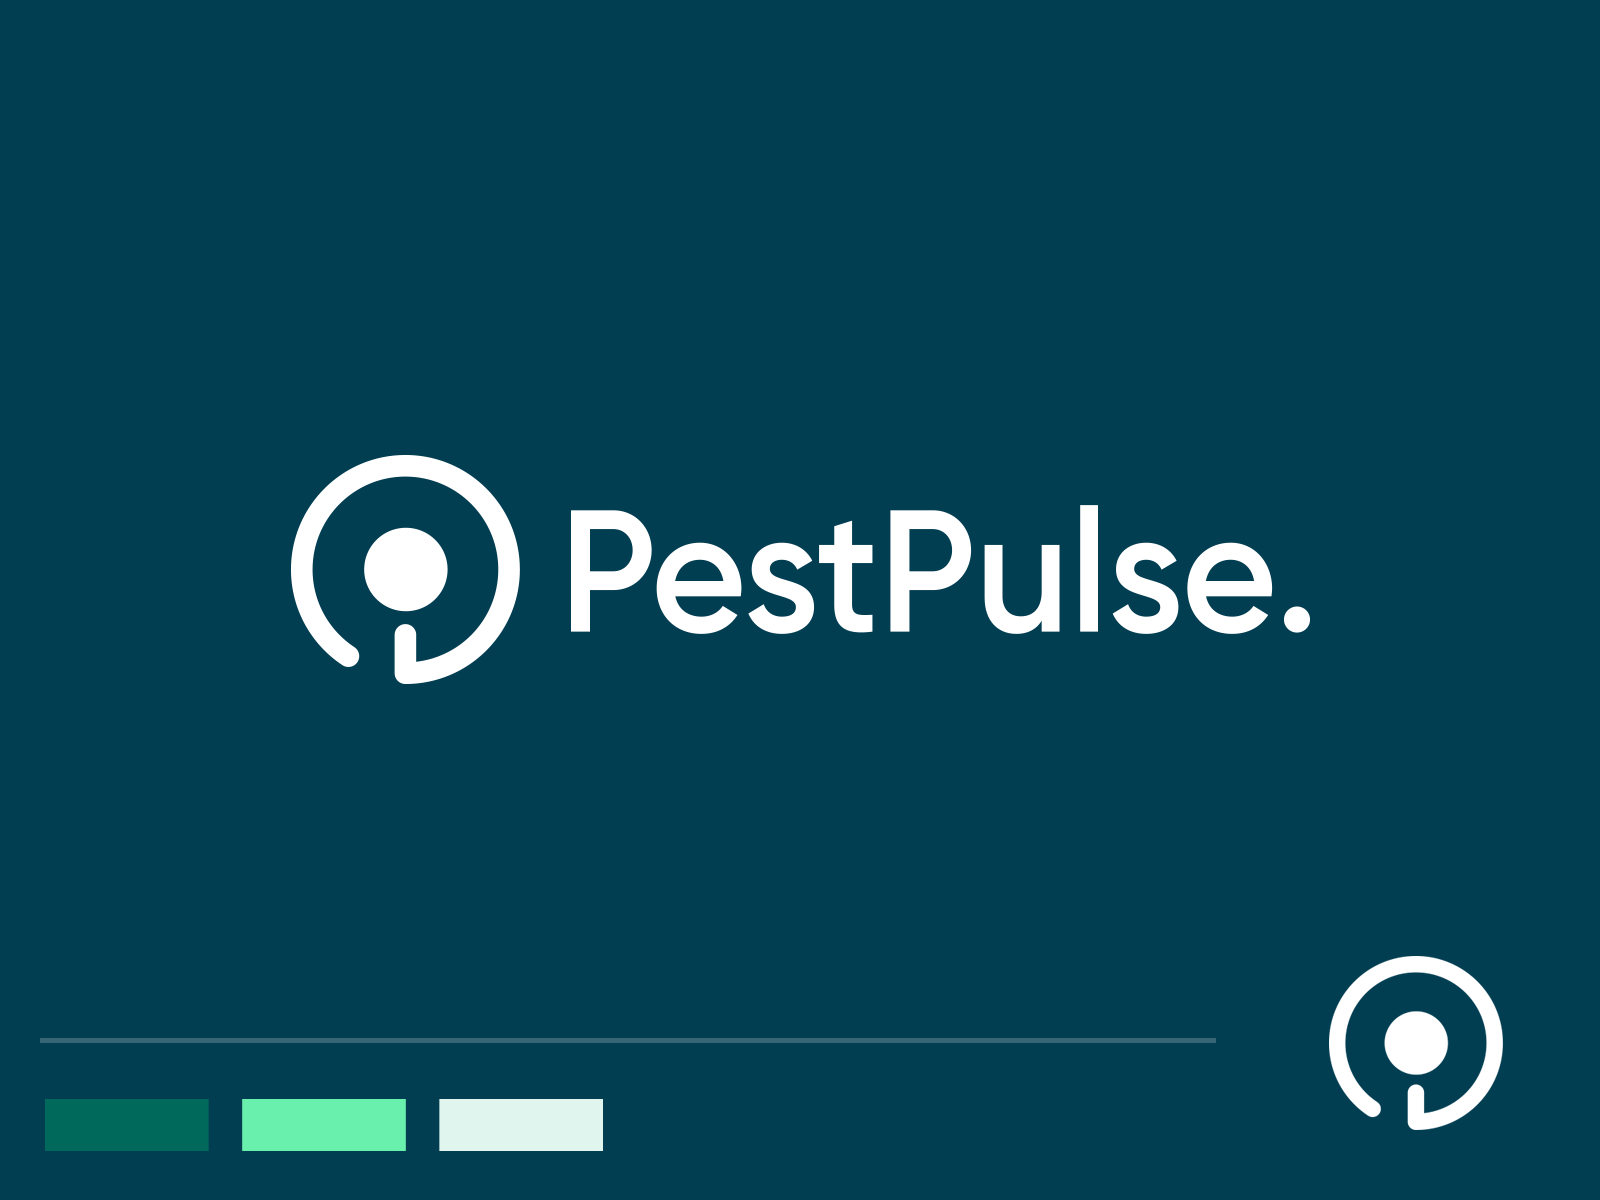 Pest Control Logo Pest Control Logo Pest Control Pest Control Roaches